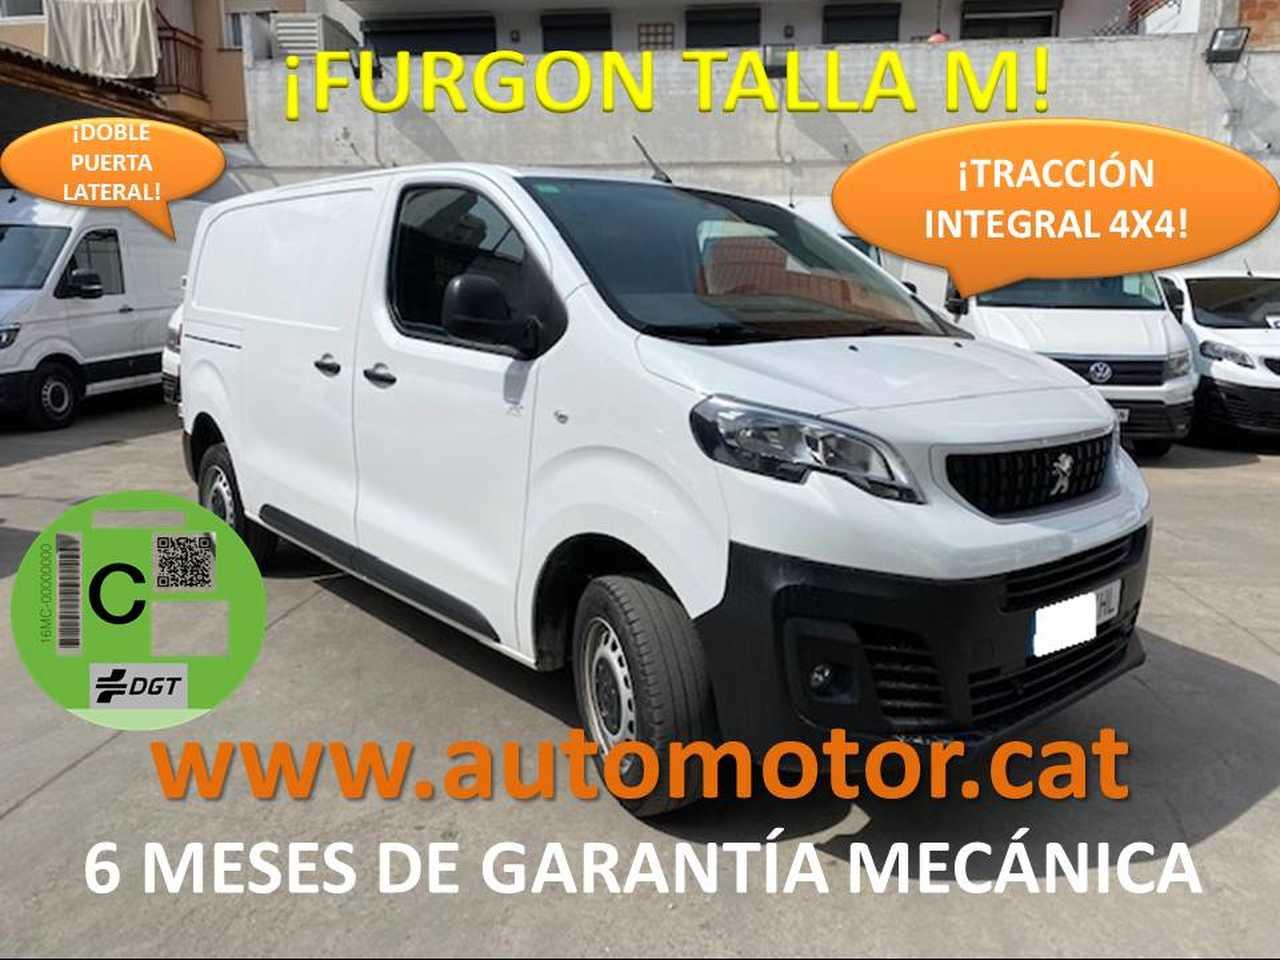 Peugeot Expert Fg. Standard 1.6BlueHDi S&S Pro 115 - GARANTIA MECANICA  - Foto 1